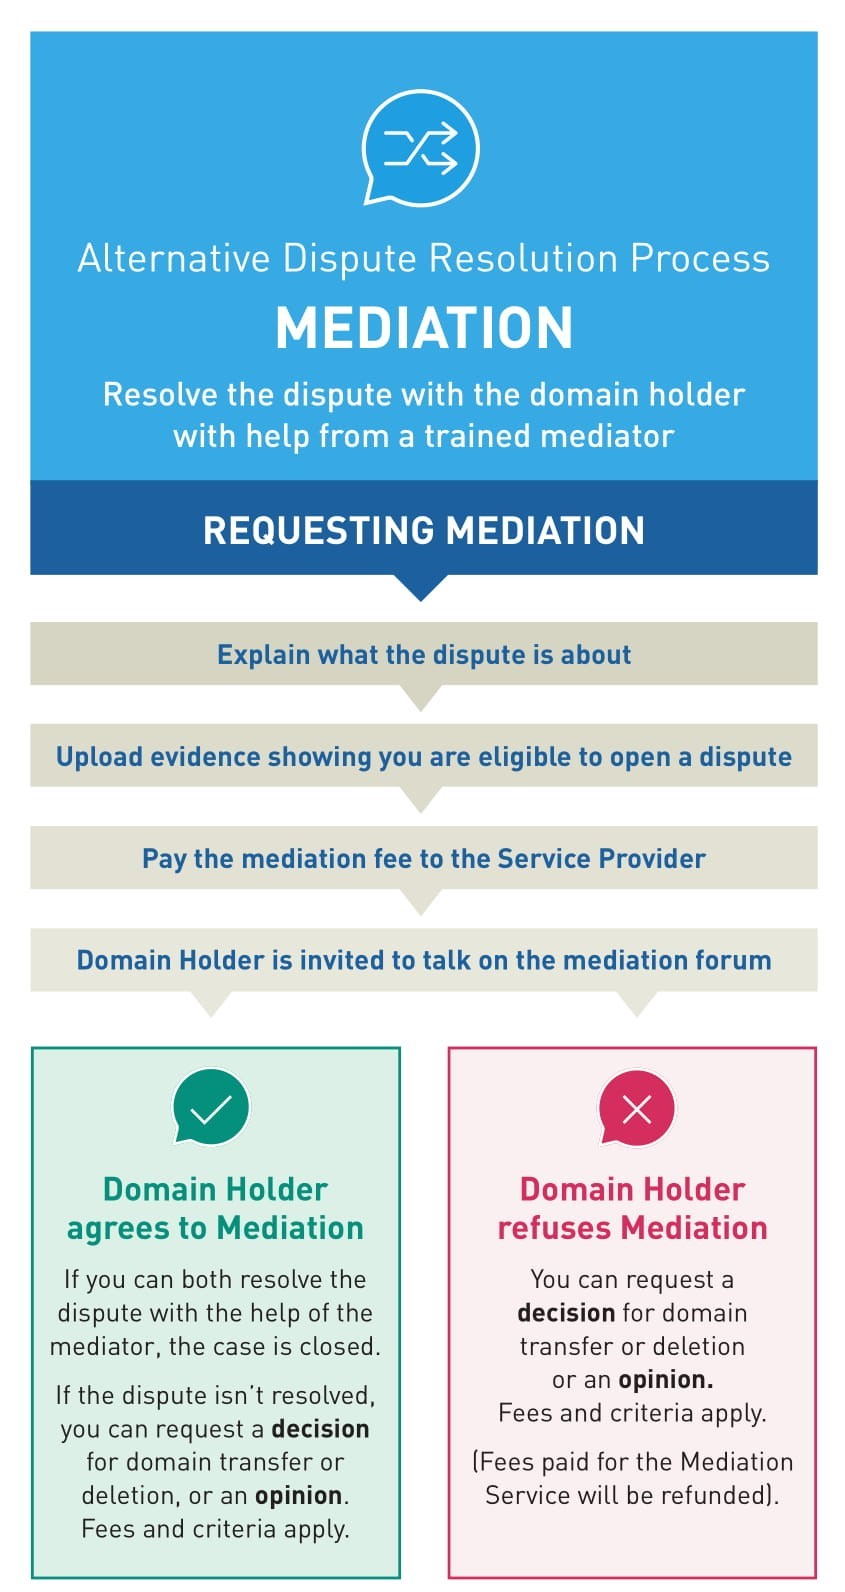 Alternative Dispute Resolution Process Graphic: Mediation